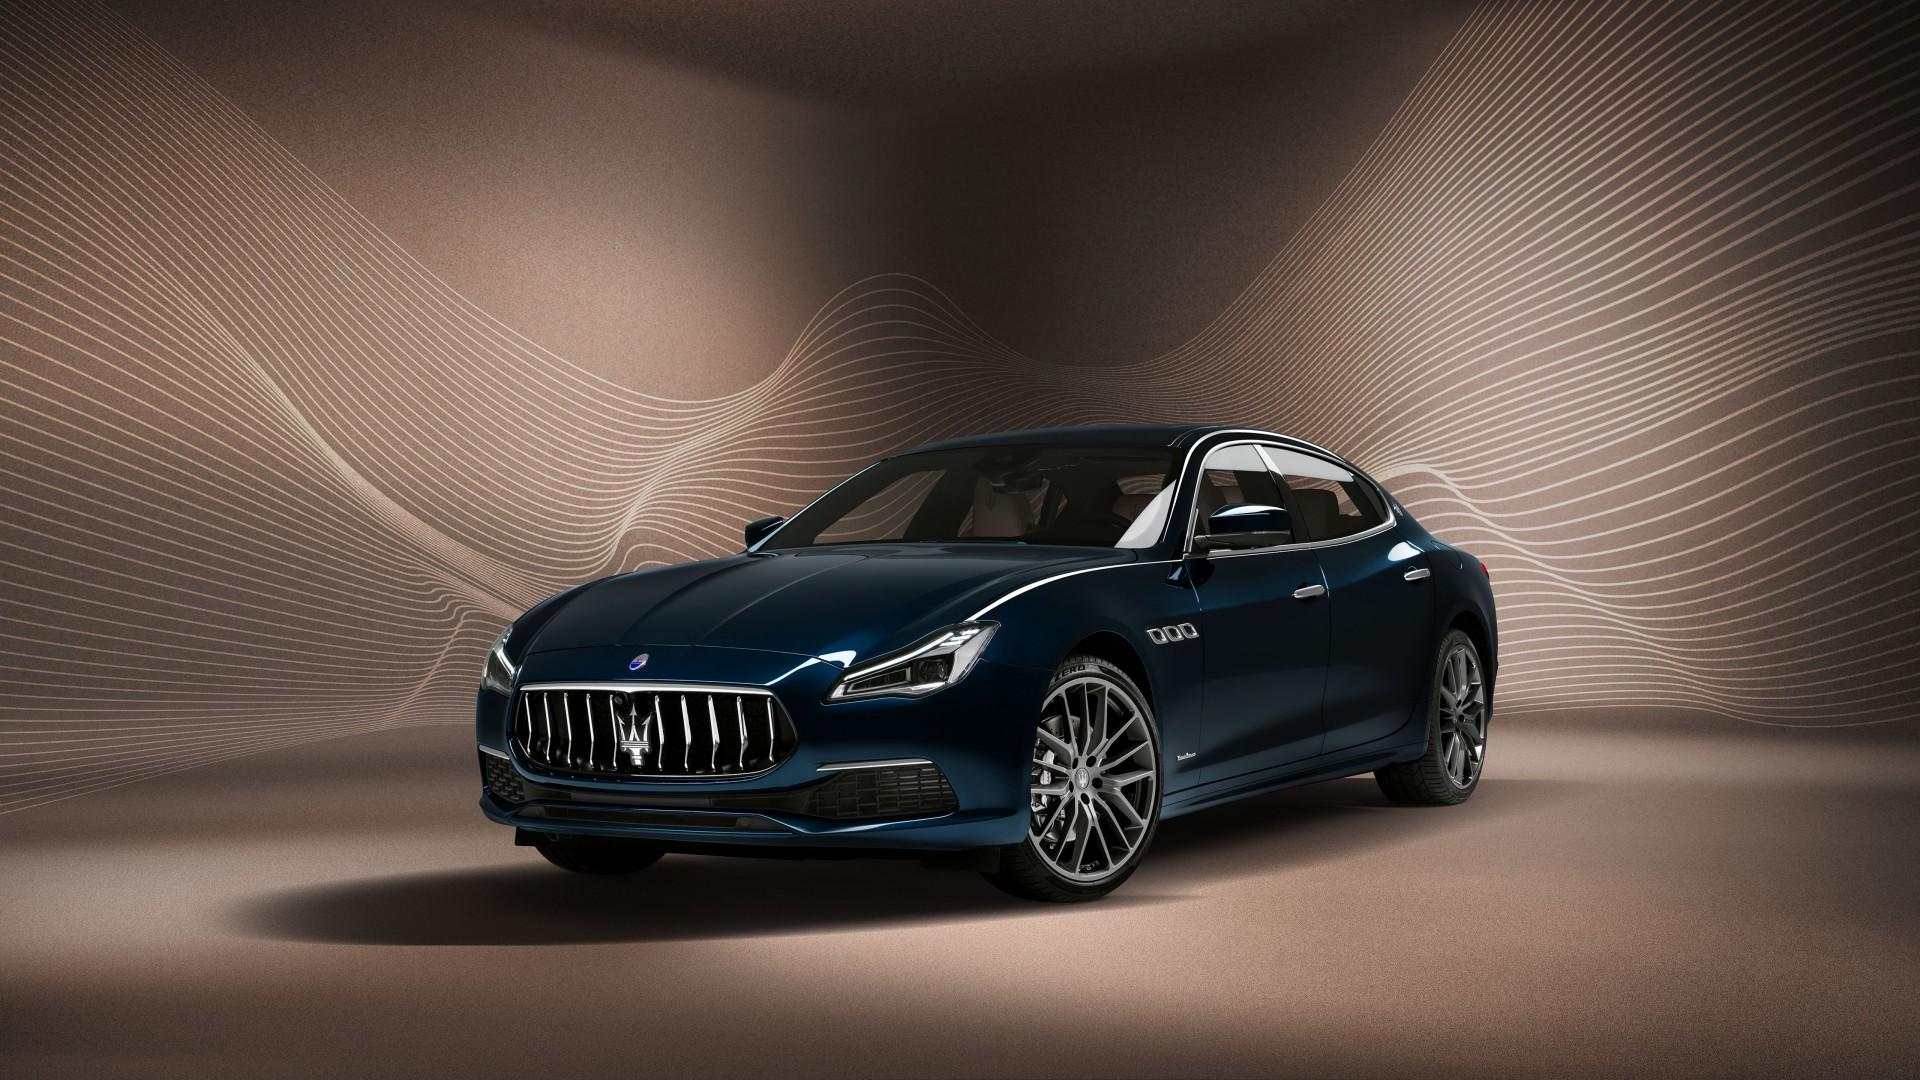 Maserati Quattroporte GranLusso Royale 2020 5K Wallpaper HD Car 1920x1080